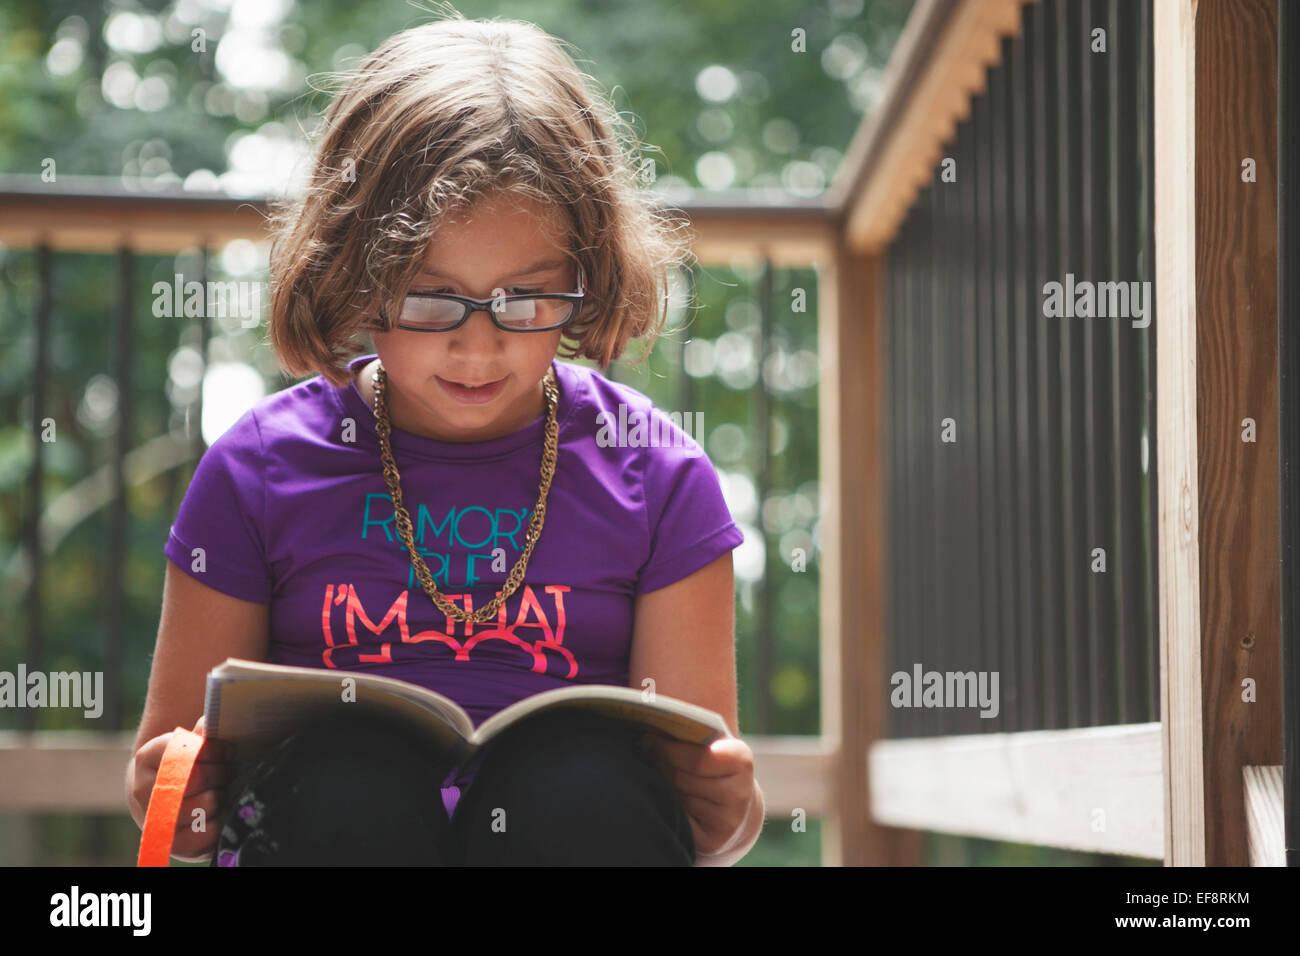 Girl (6-7) reading book on balcony - Stock Image